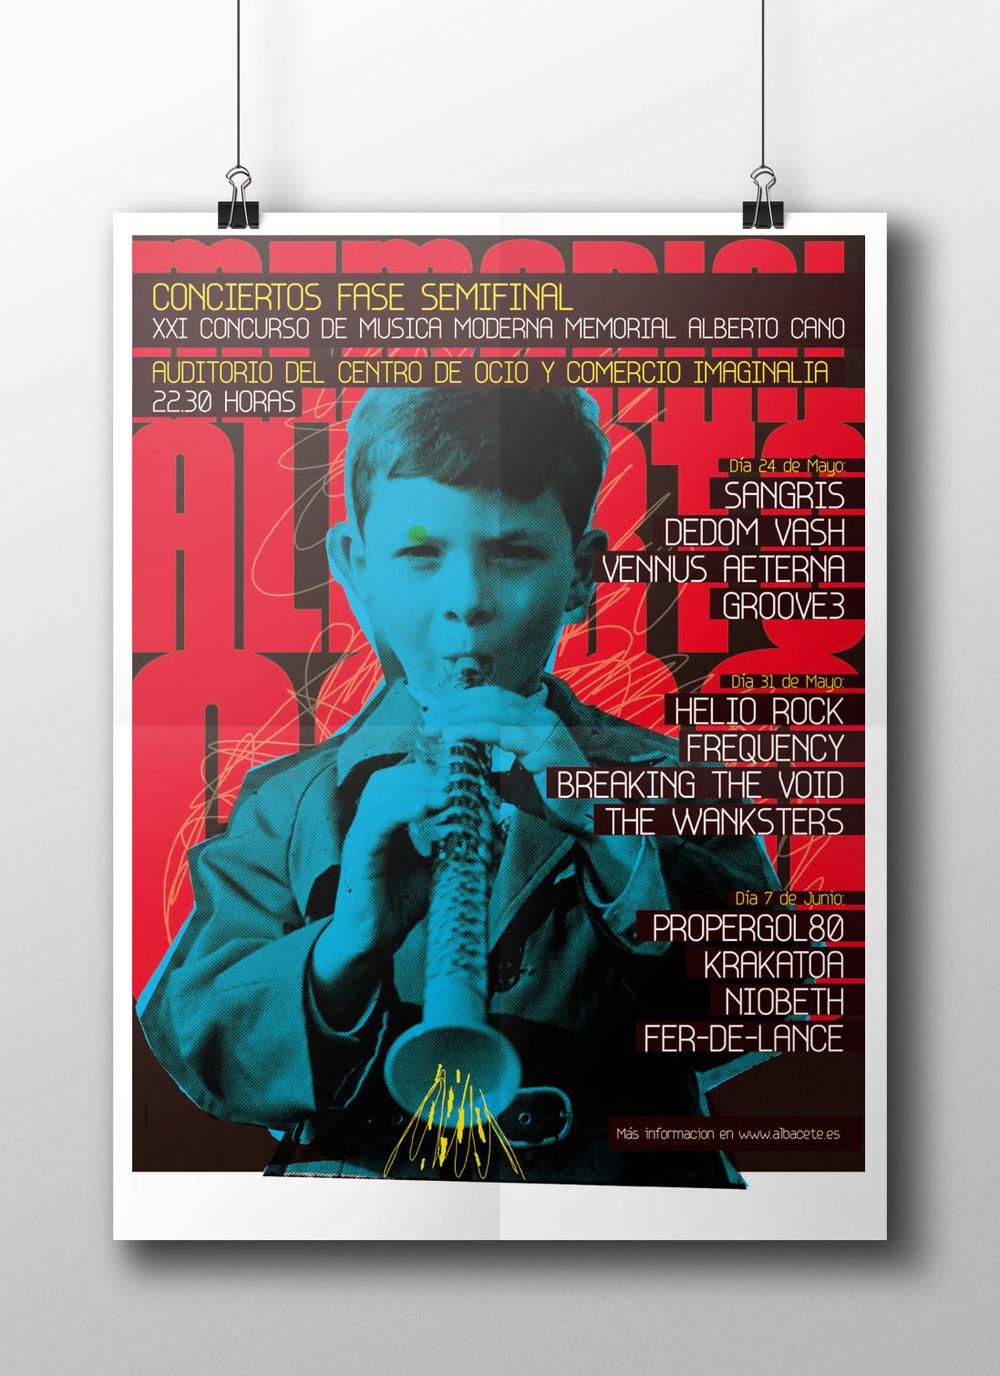 poster_mockup_MD3.jpg